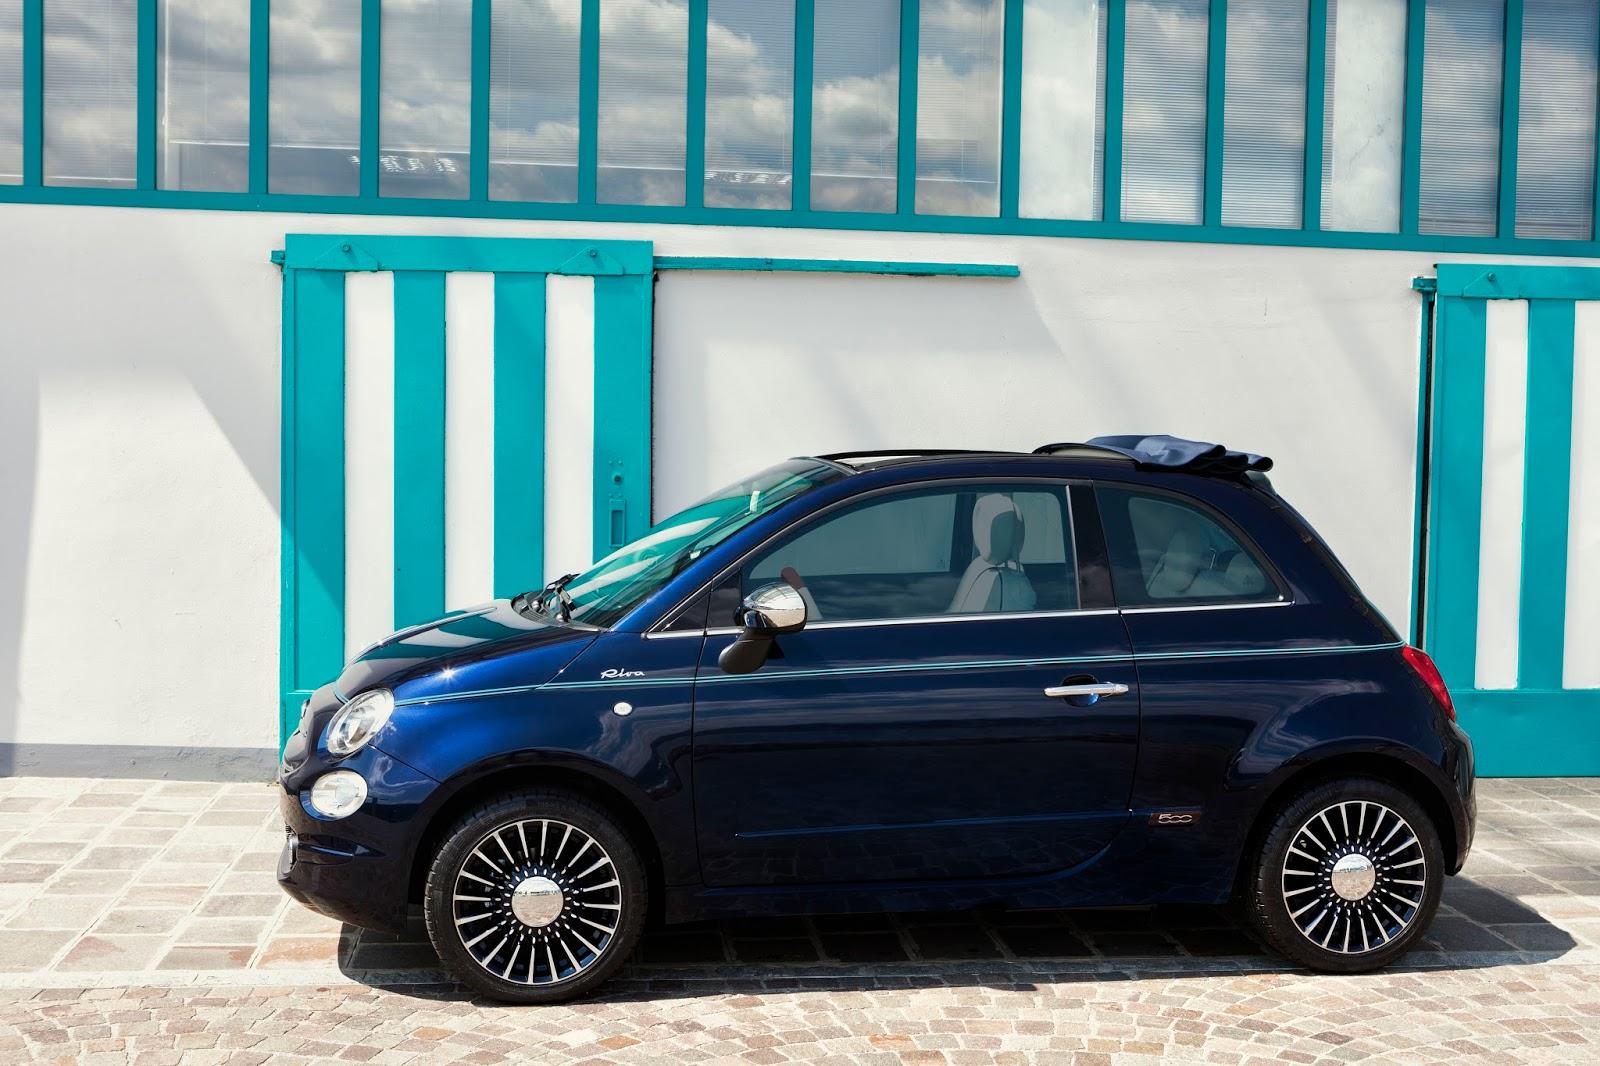 160627 Fiat 500 Riva 09 Fiat 500 Riva : Το κομψό έγινε και πολυτελές Fiat, Fiat 500, Fiat 500 Riva, Fiat 500C, Riva, supermini, videos